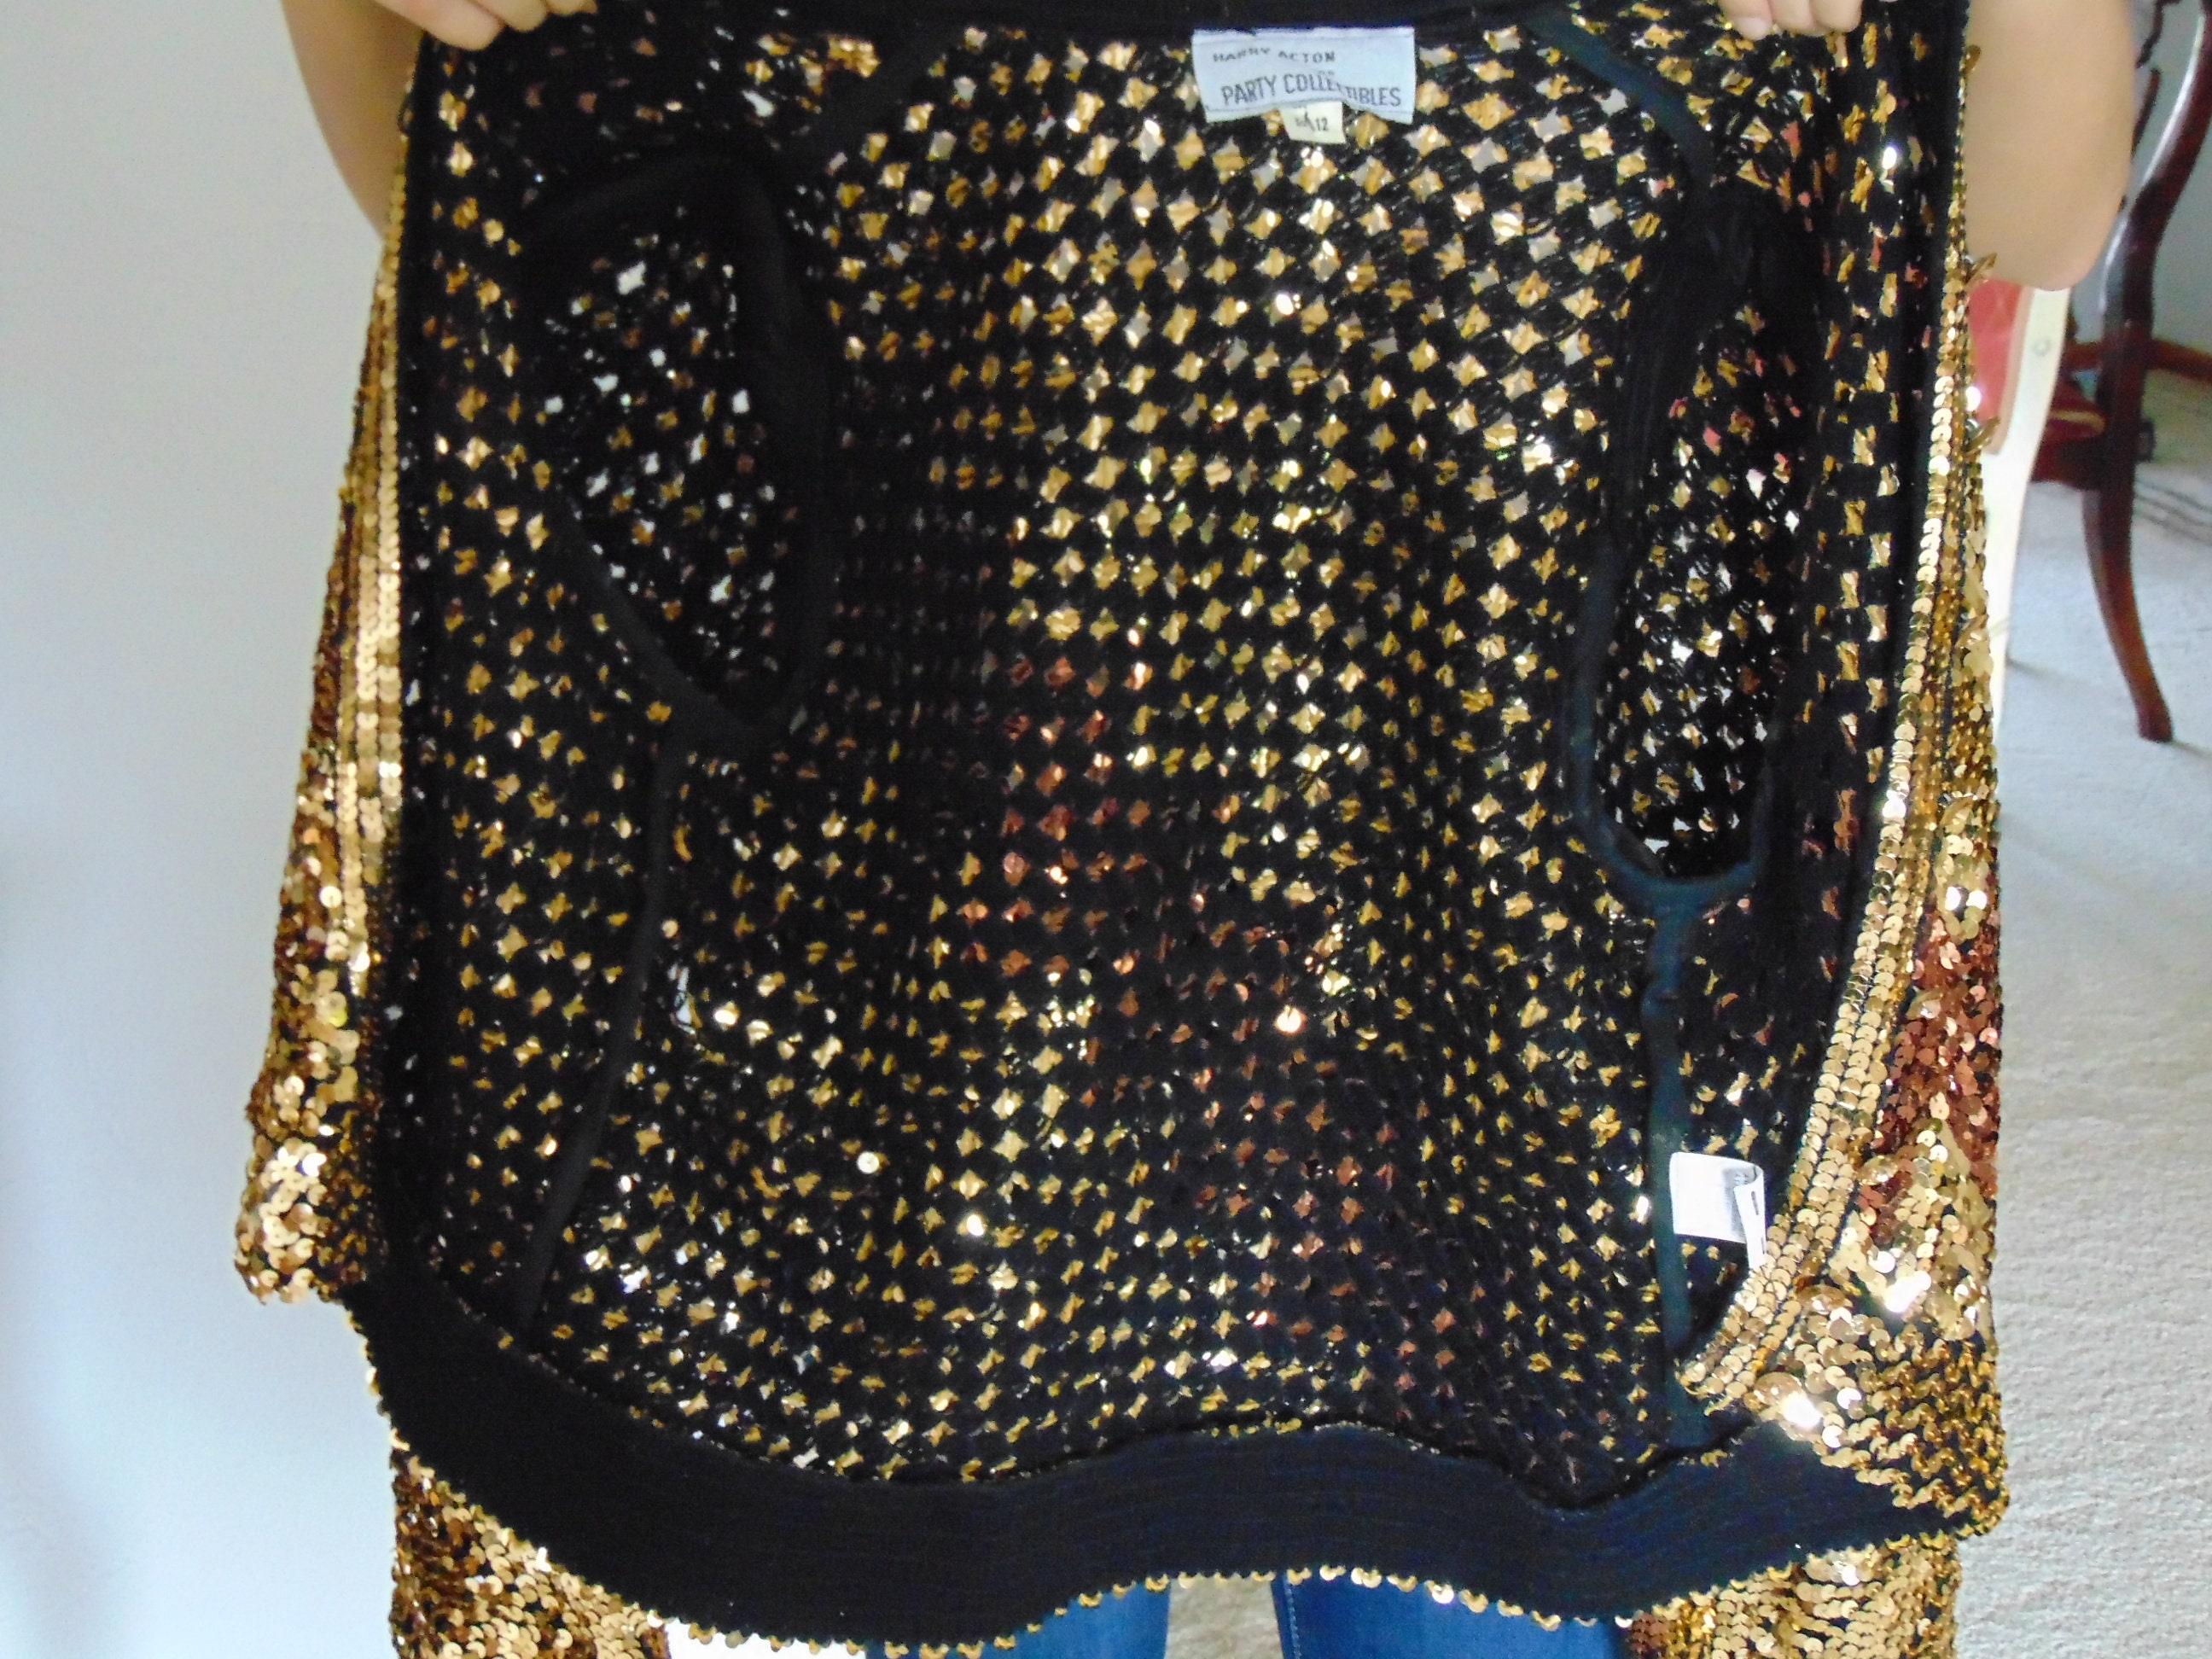 907b41e5 70's Sequin Jacket, Sequin Shrug, Vintage Sequin Fashion, Sequin ...